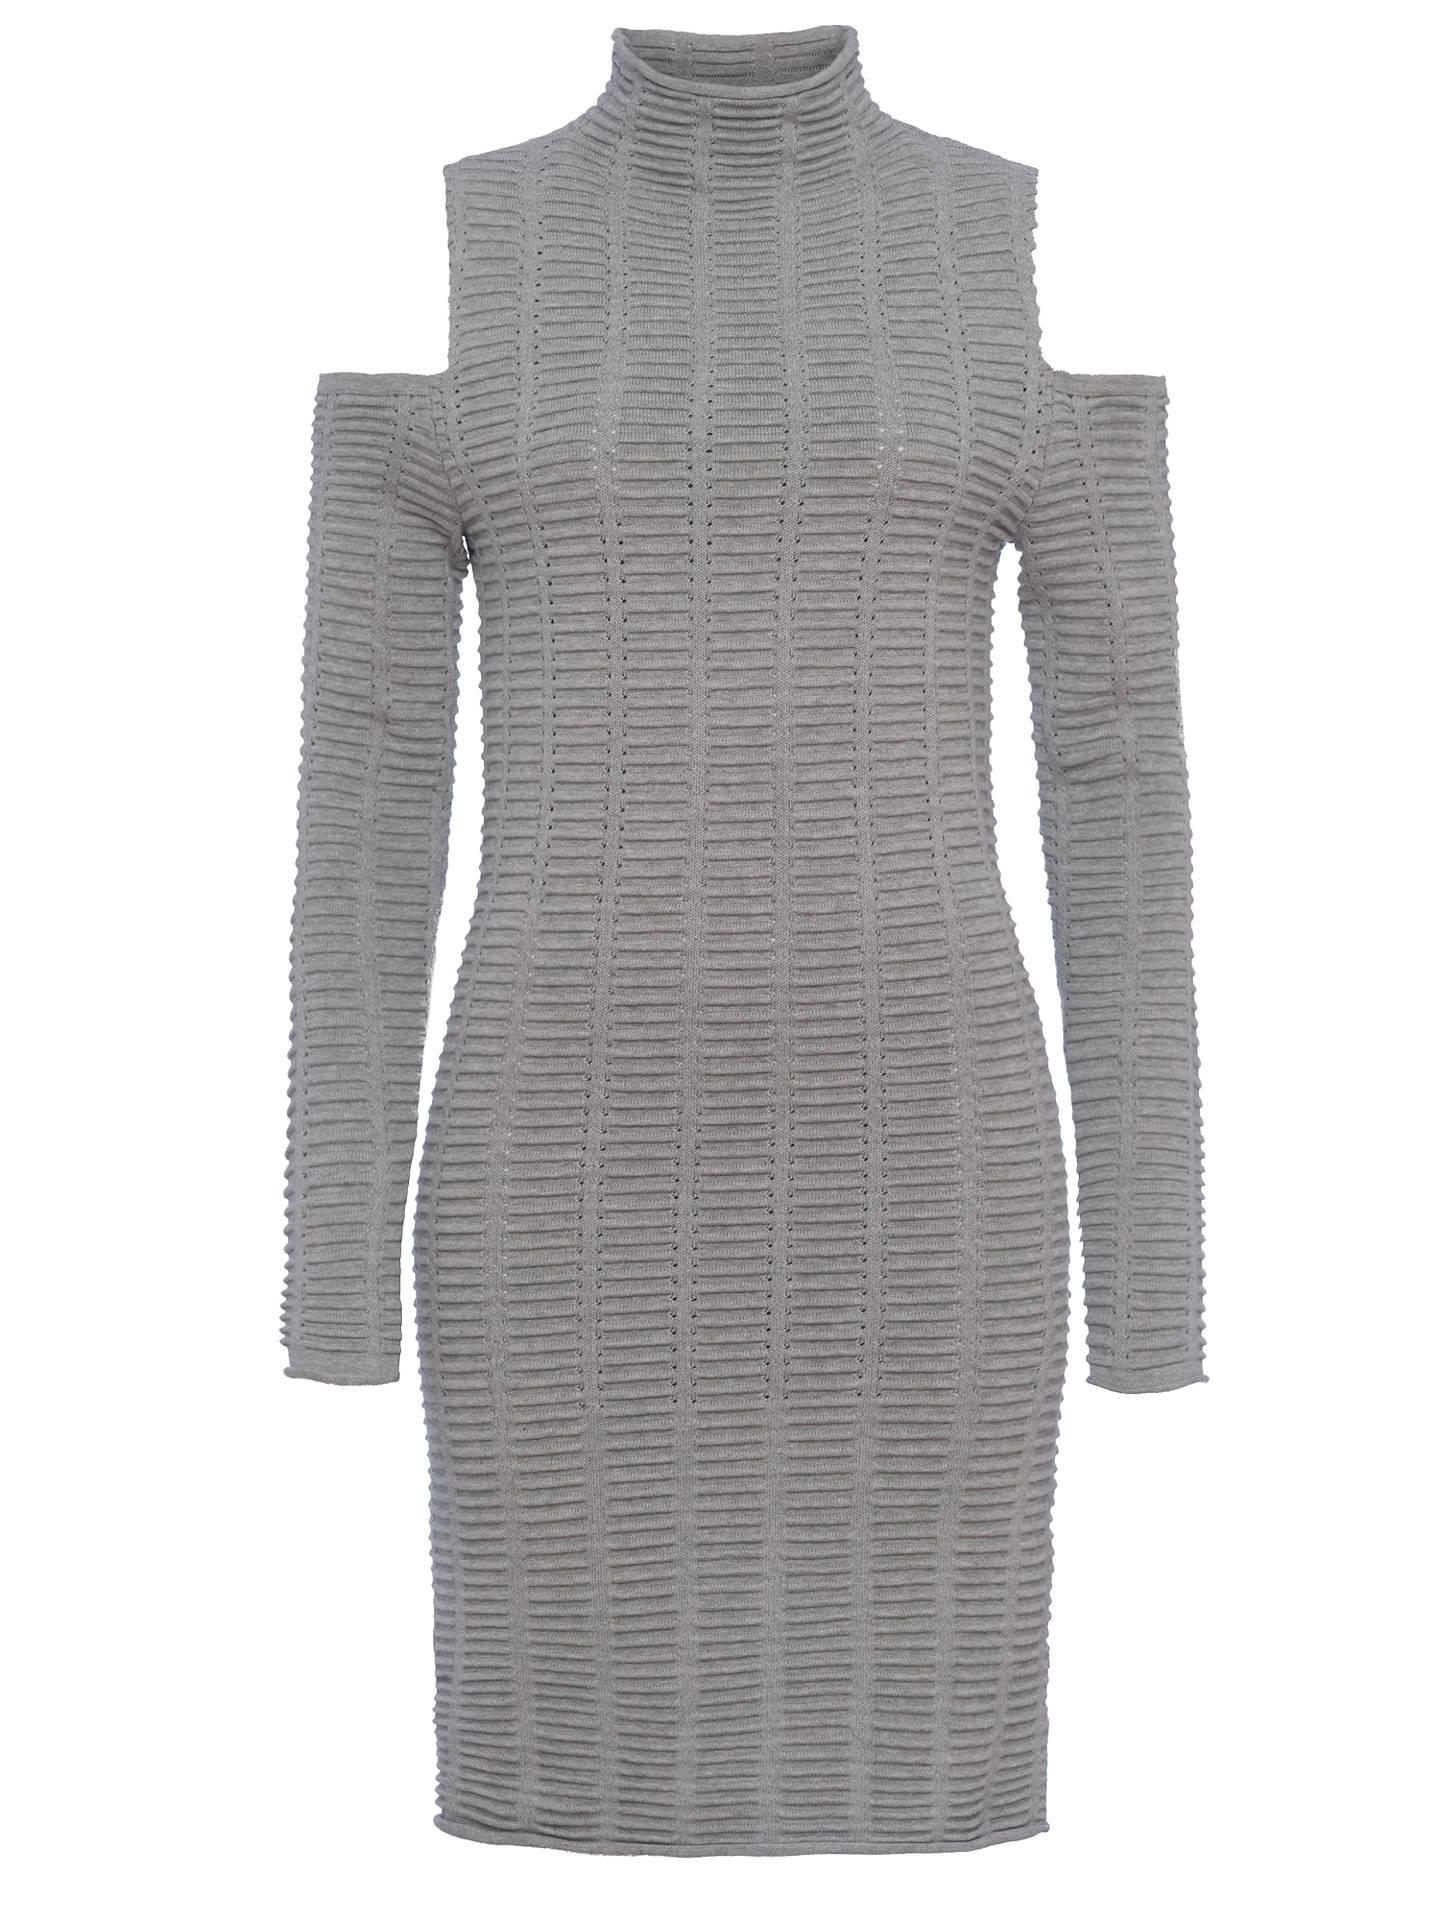 1c46f8db112 ... Buy French Connection Mozart Ladder Dress, Light Grey, 6 Online at  johnlewis.com